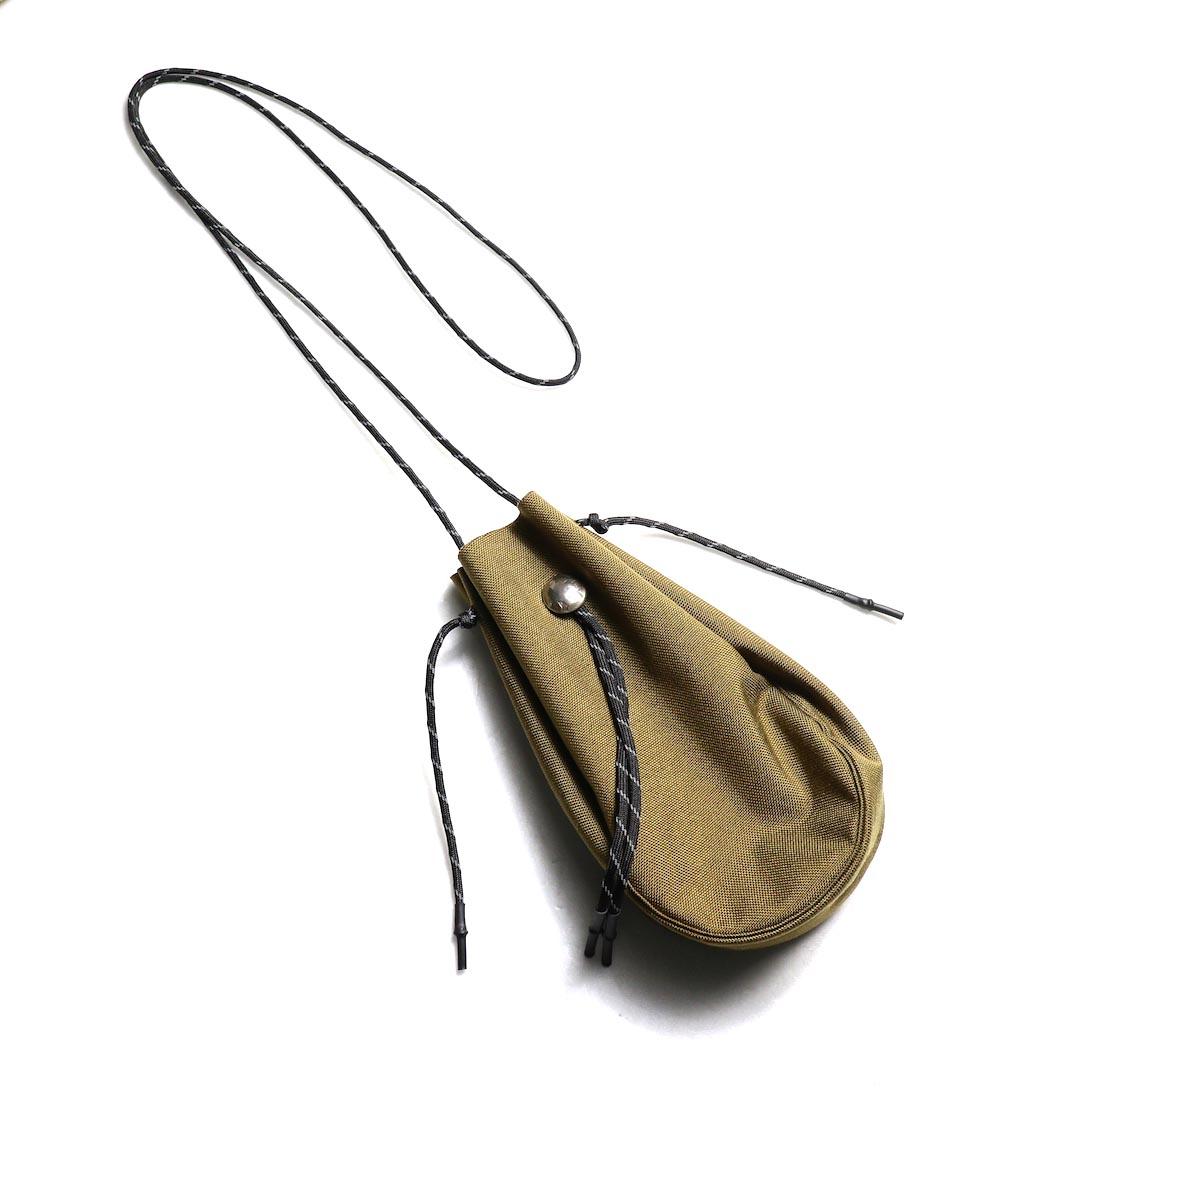 吉岡衣料店 / drawstring bag -S-. w/concho. (Coyote)正面